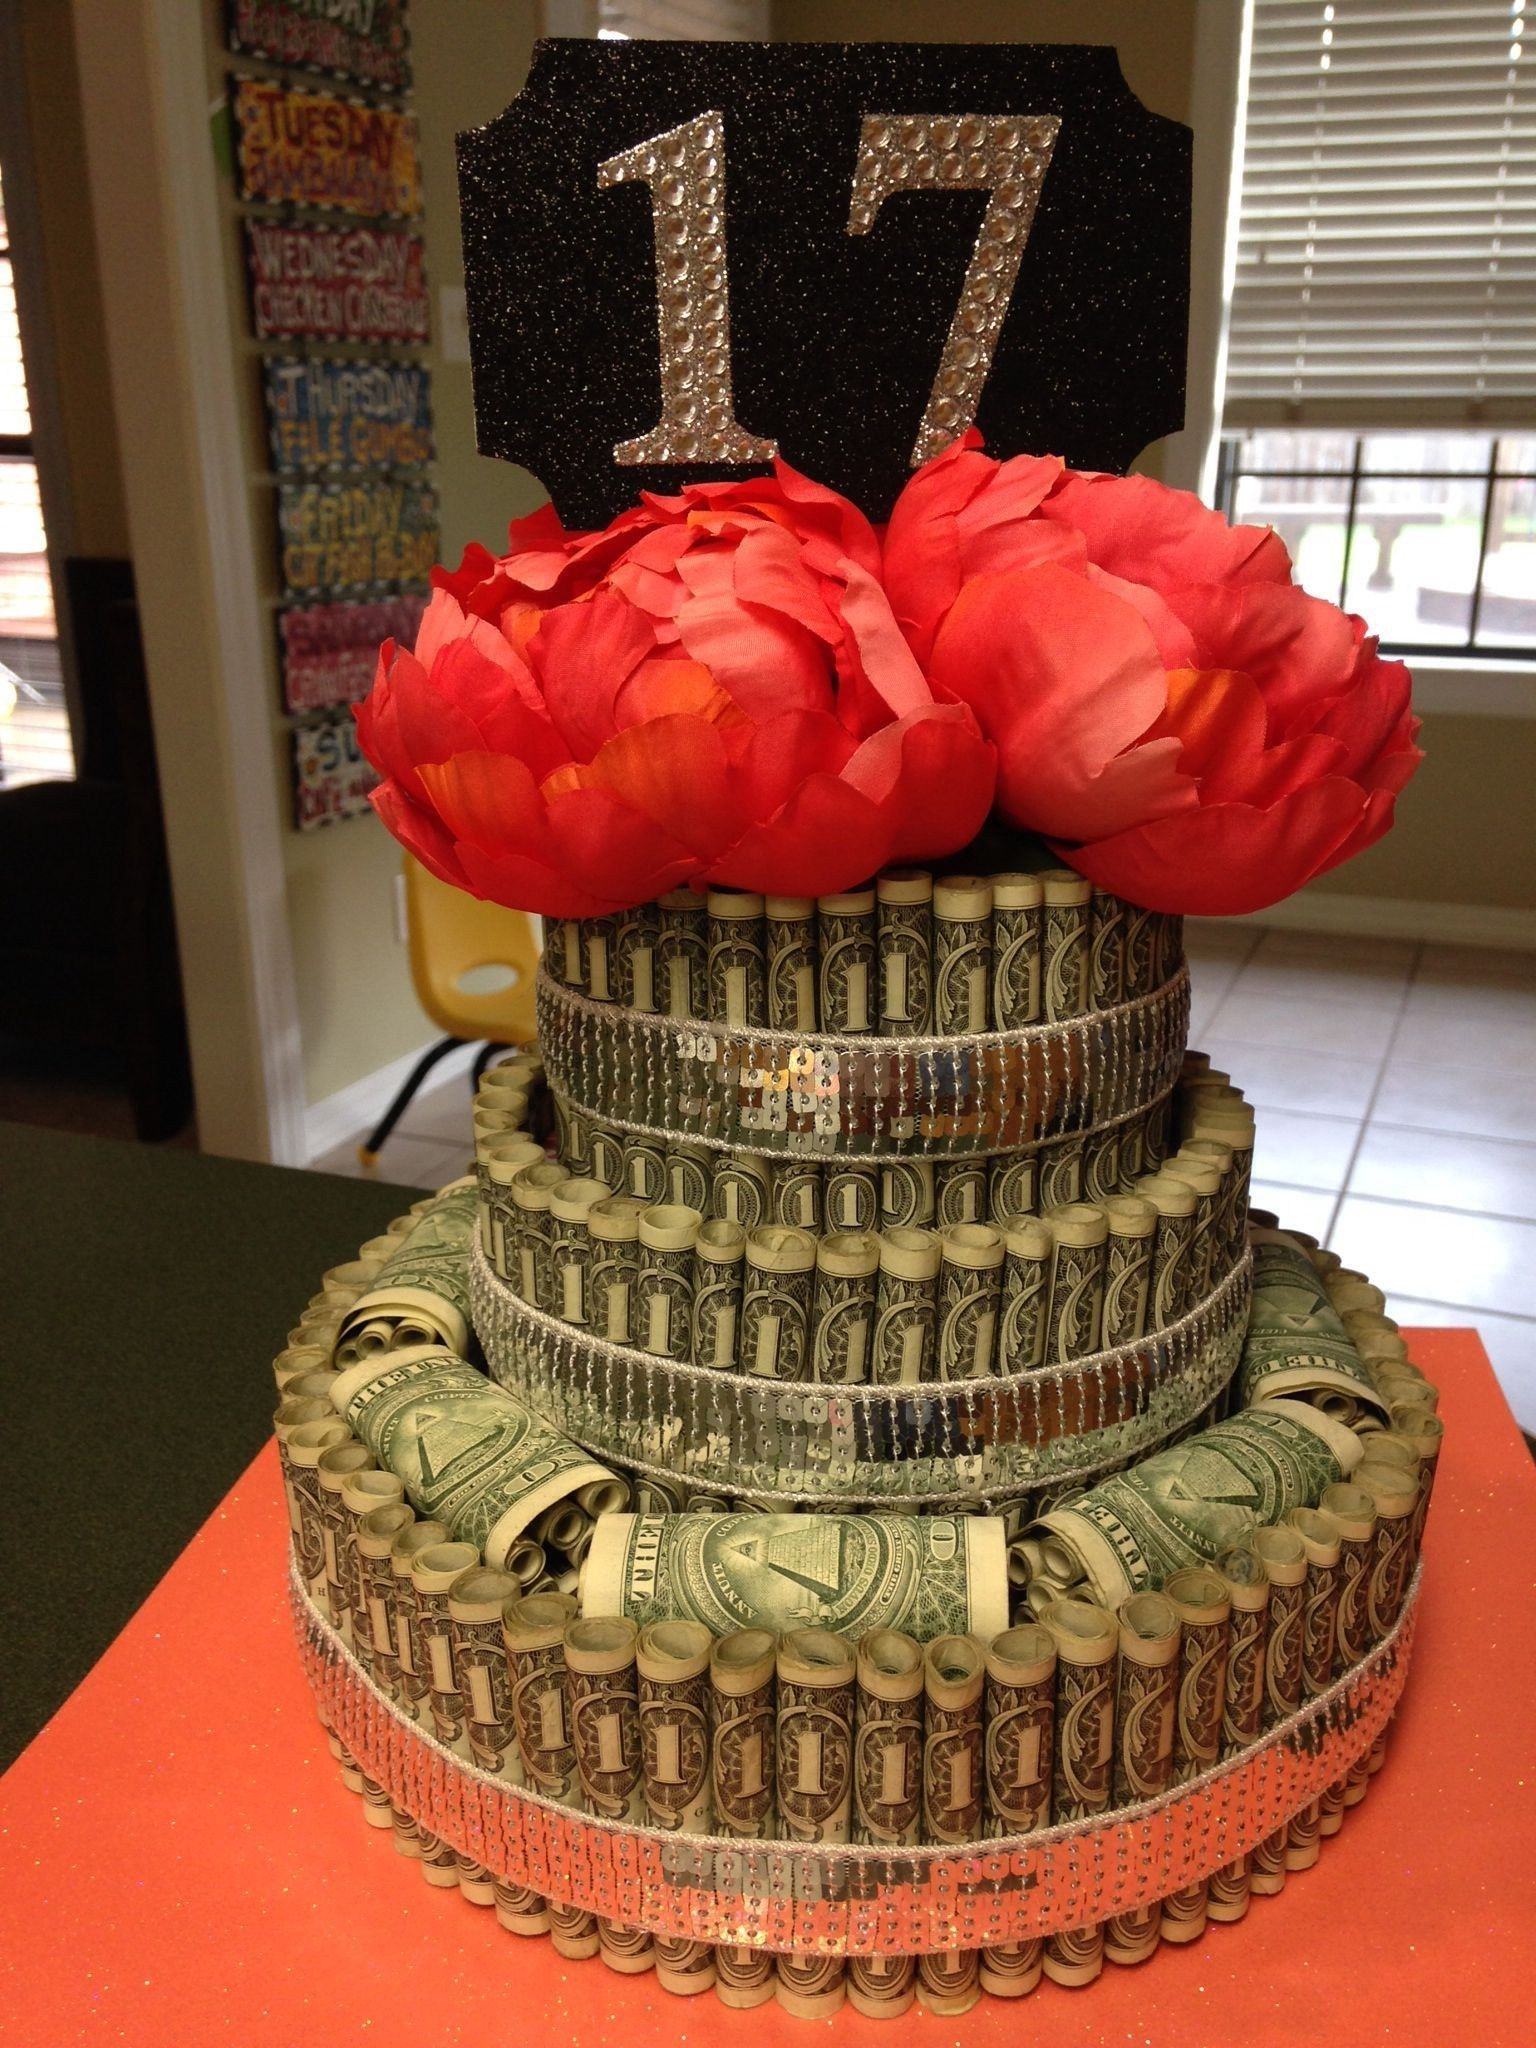 17 Year Old Birthday Cake Ideas Birthday Cakes For 17 Yr Old Girl 17th Birthday Money Cake So I 17th Birthday Party Ideas 17th Birthday Ideas 17 Birthday Party